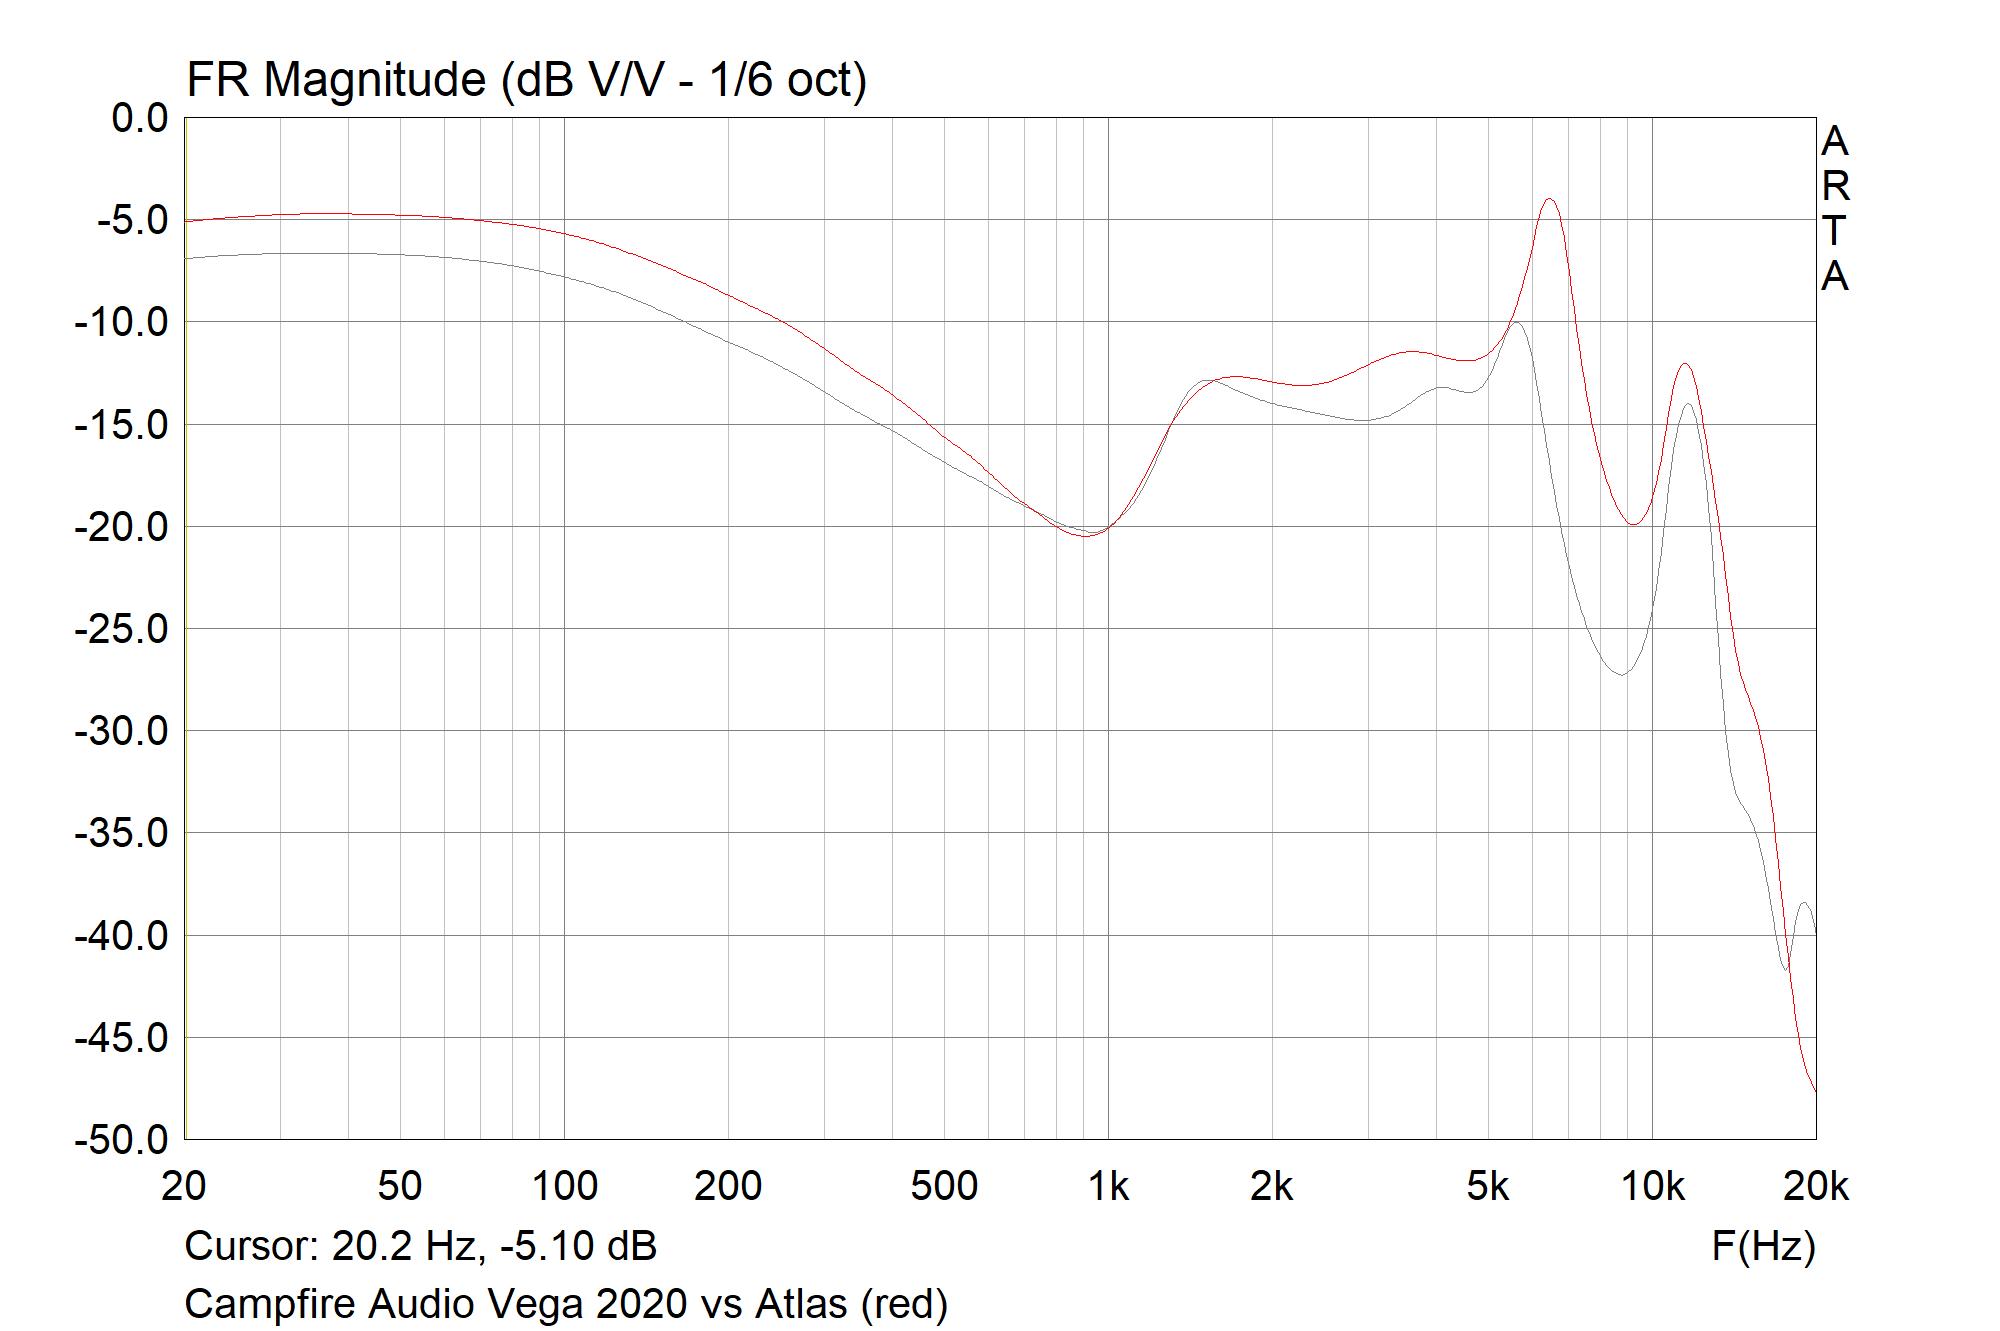 Campfire Audio Vega 2020 vs Atlas (red).png